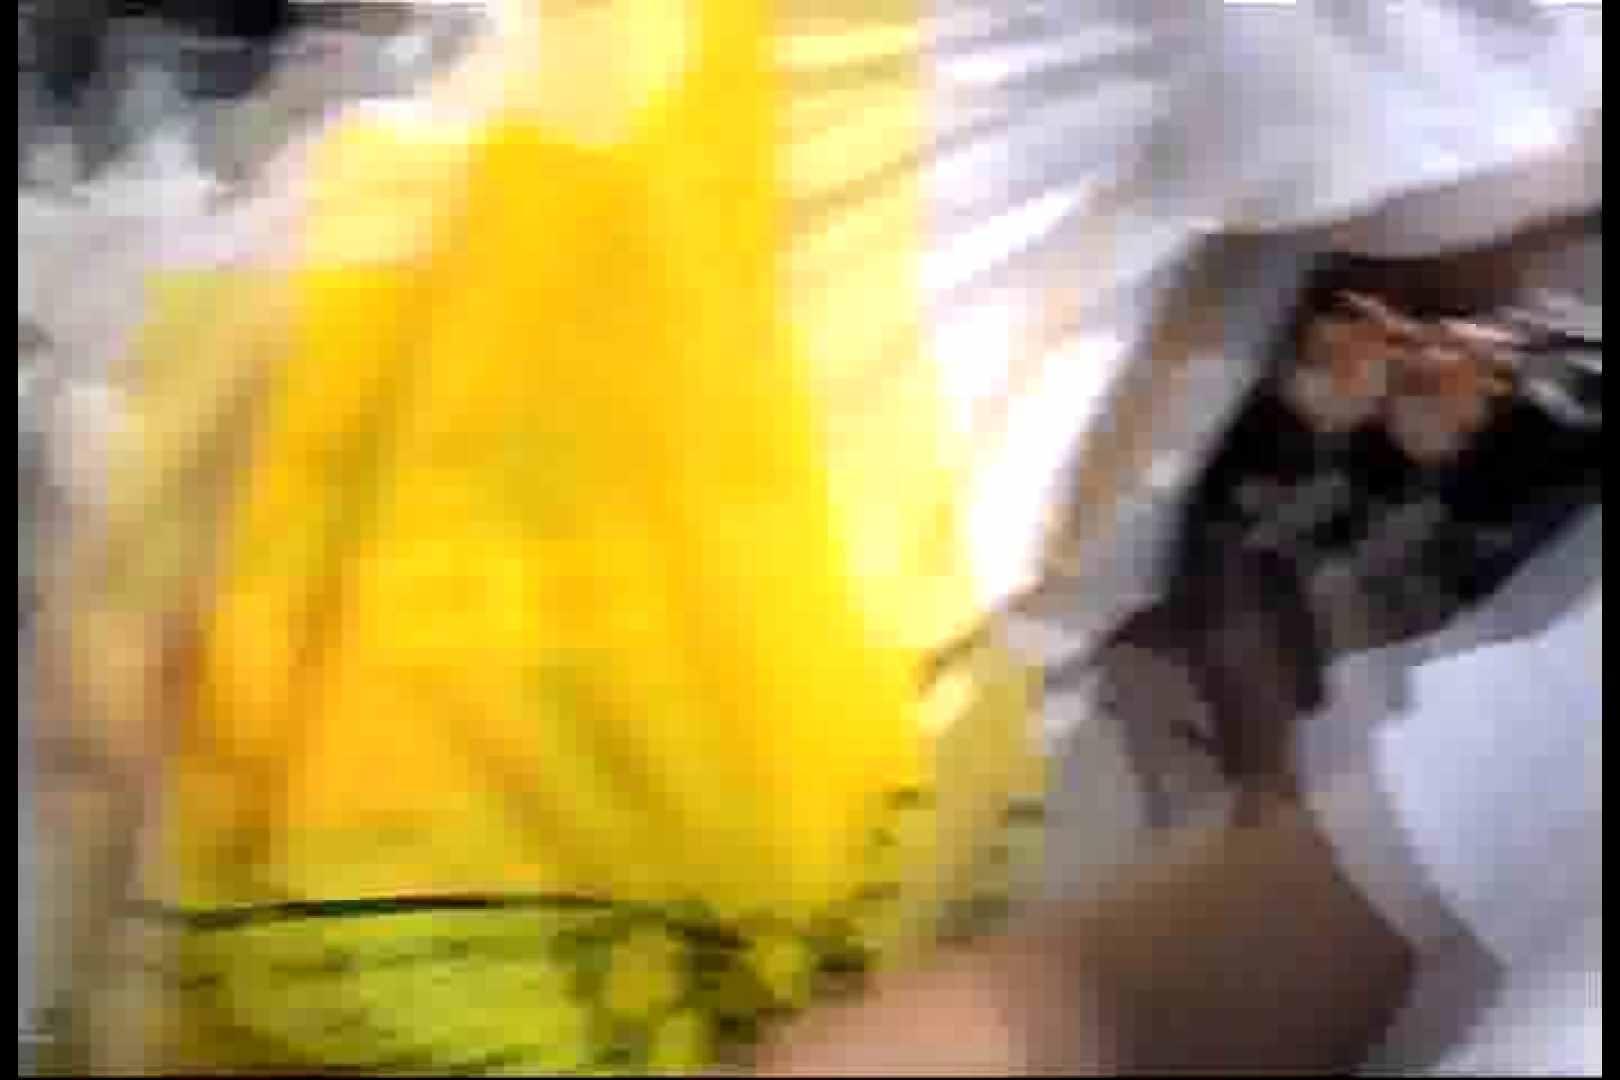 RQカメラ地獄Vol.5 エロティックなOL オマンコ動画キャプチャ 103画像 58